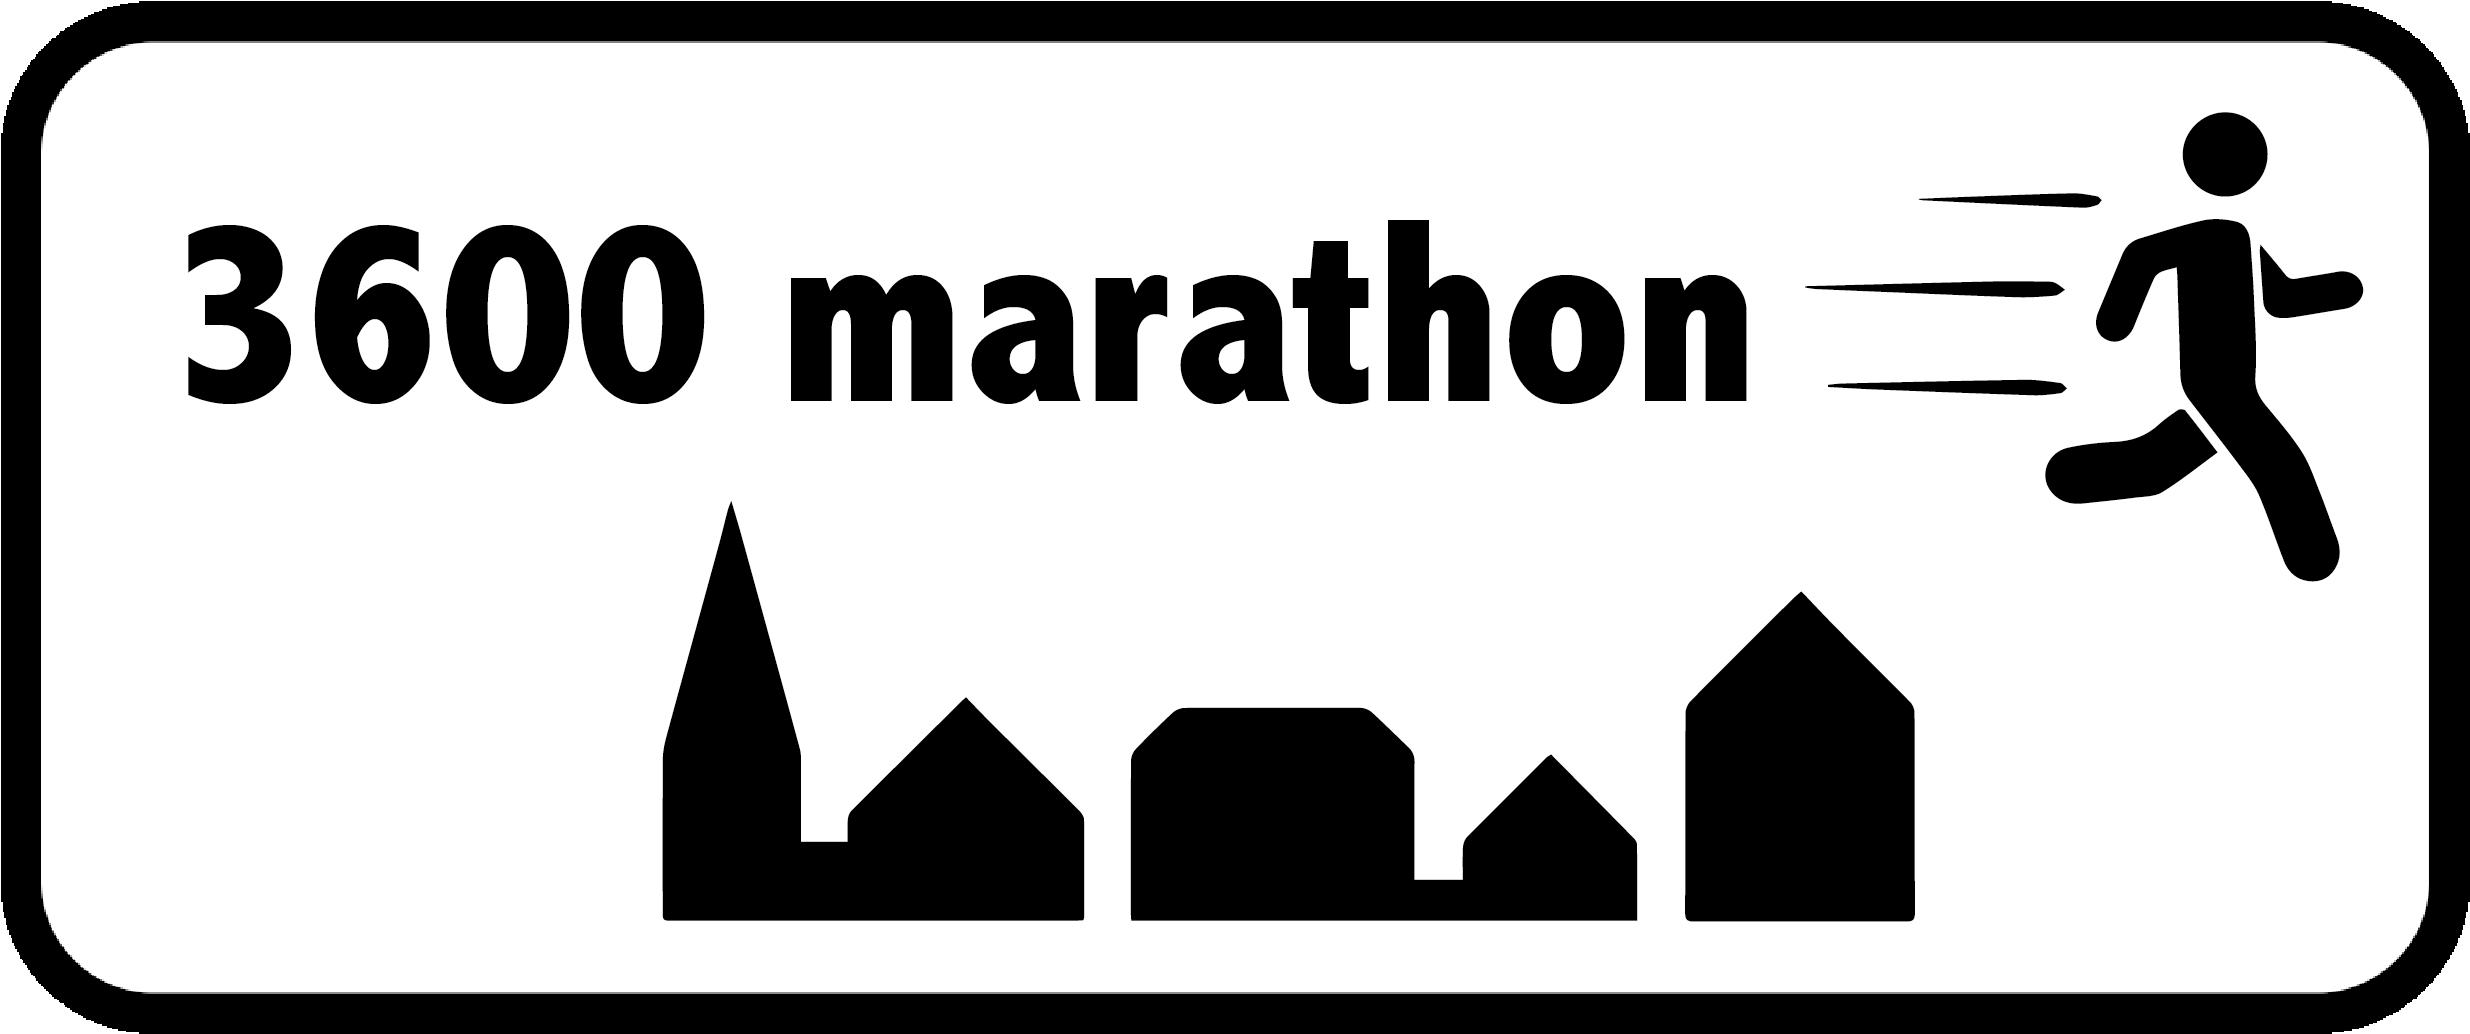 3600 marathon – Motionsløb for alle – 5km – 11km – 21km